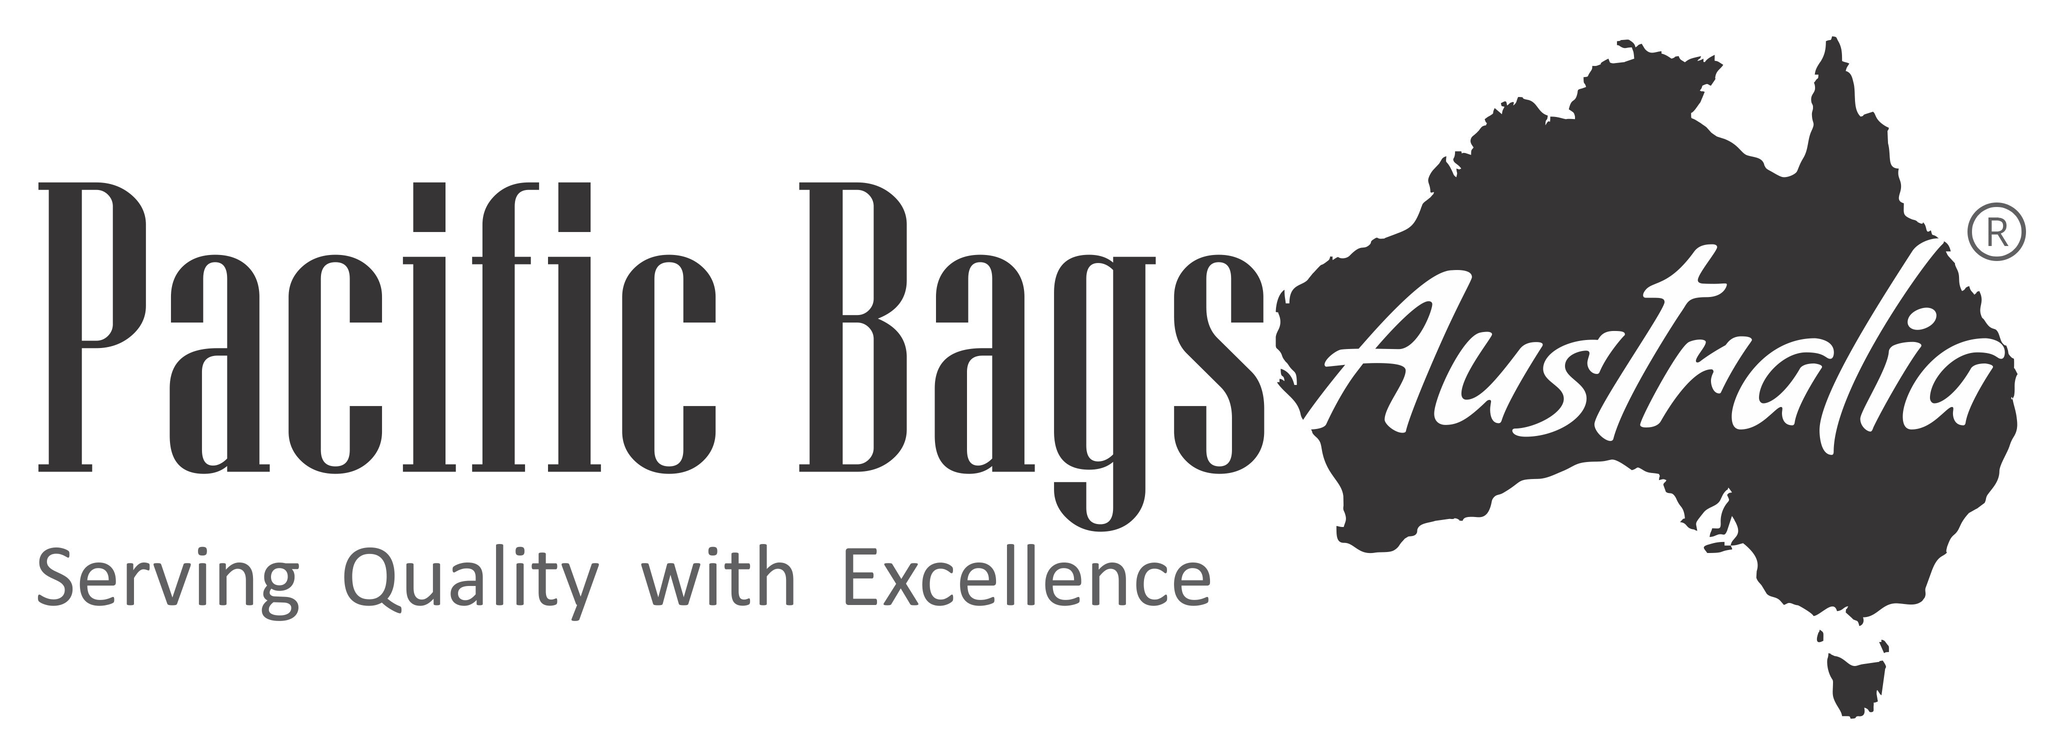 Pacific Bags Australia